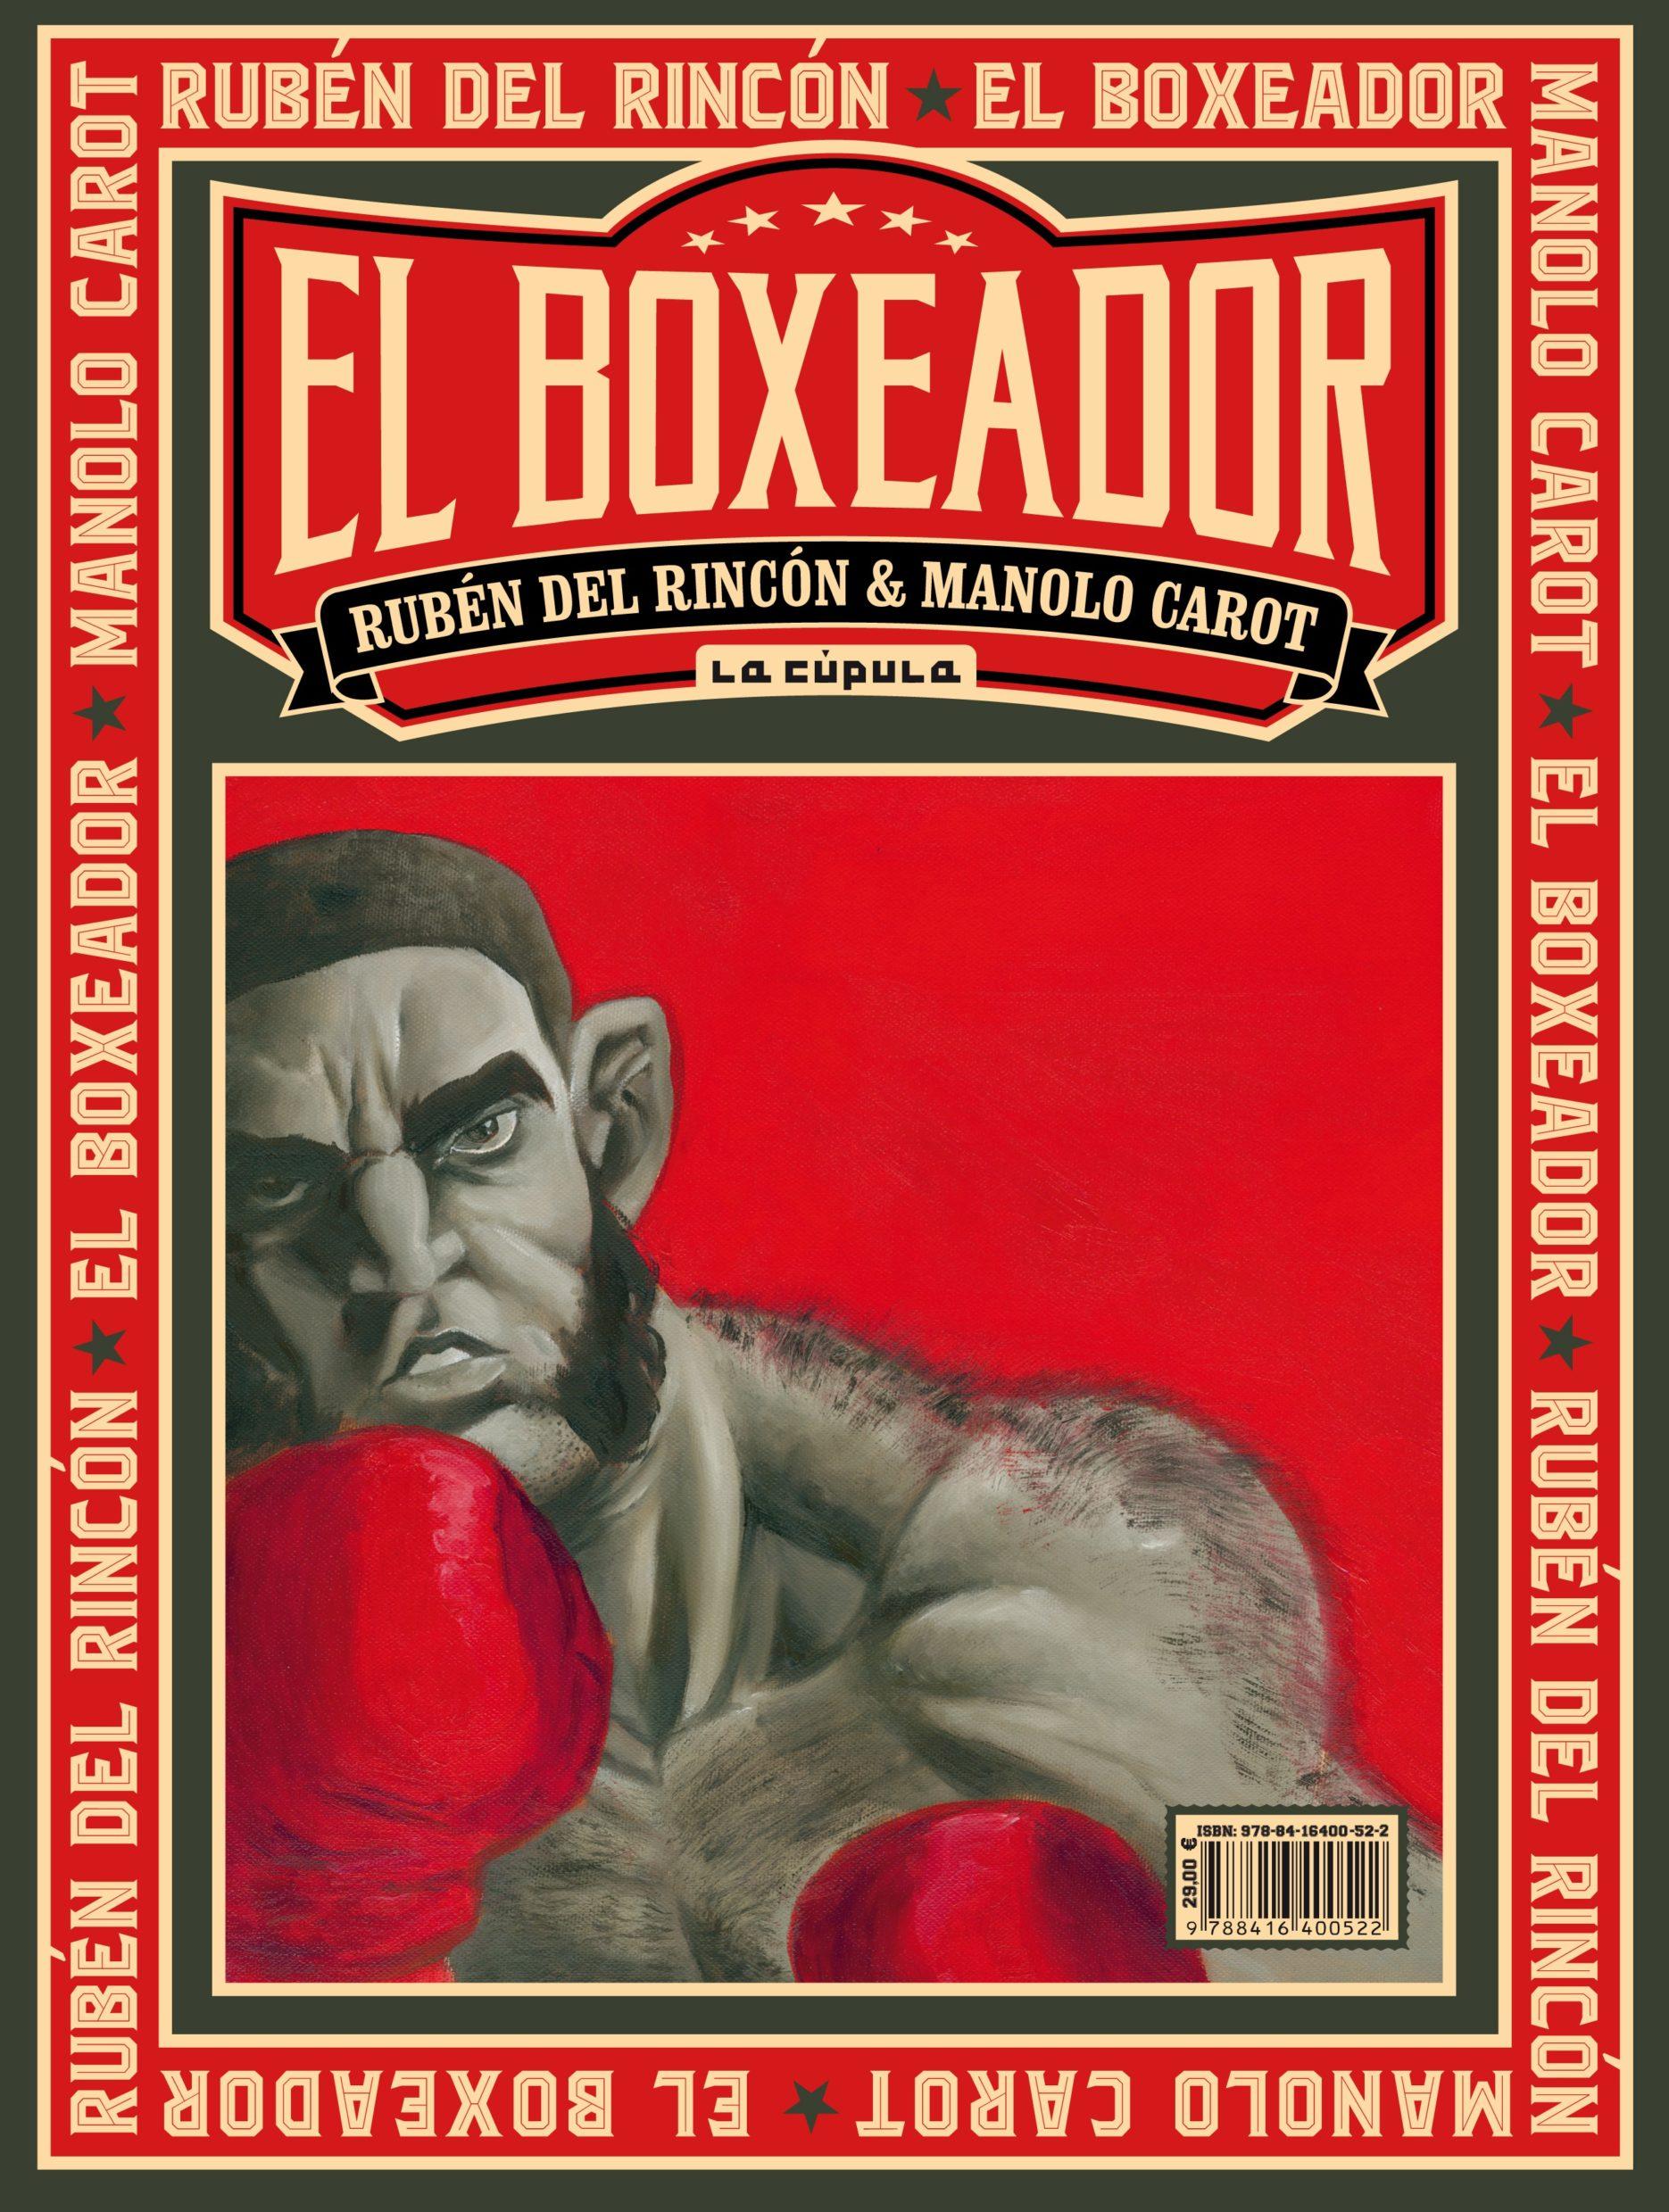 Rubén del Rincón el boxeador forro